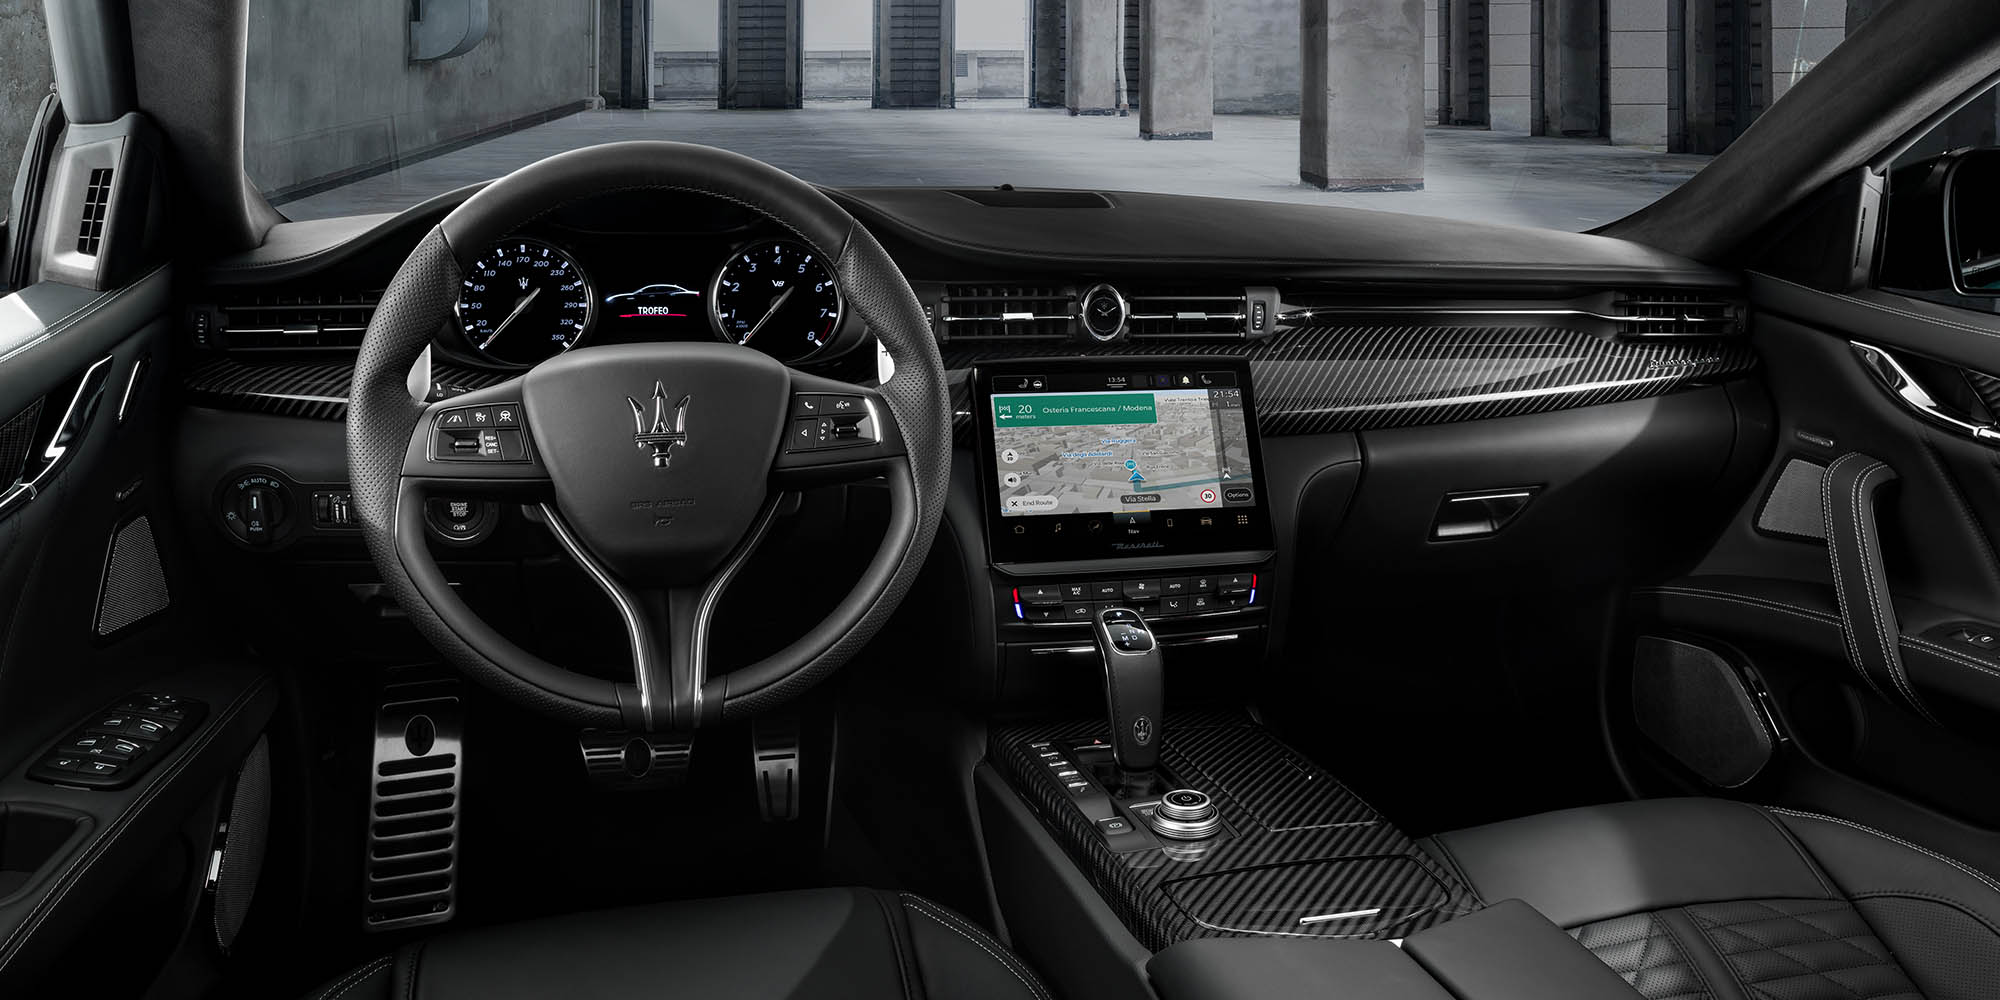 Maserati in-vehicle navigation